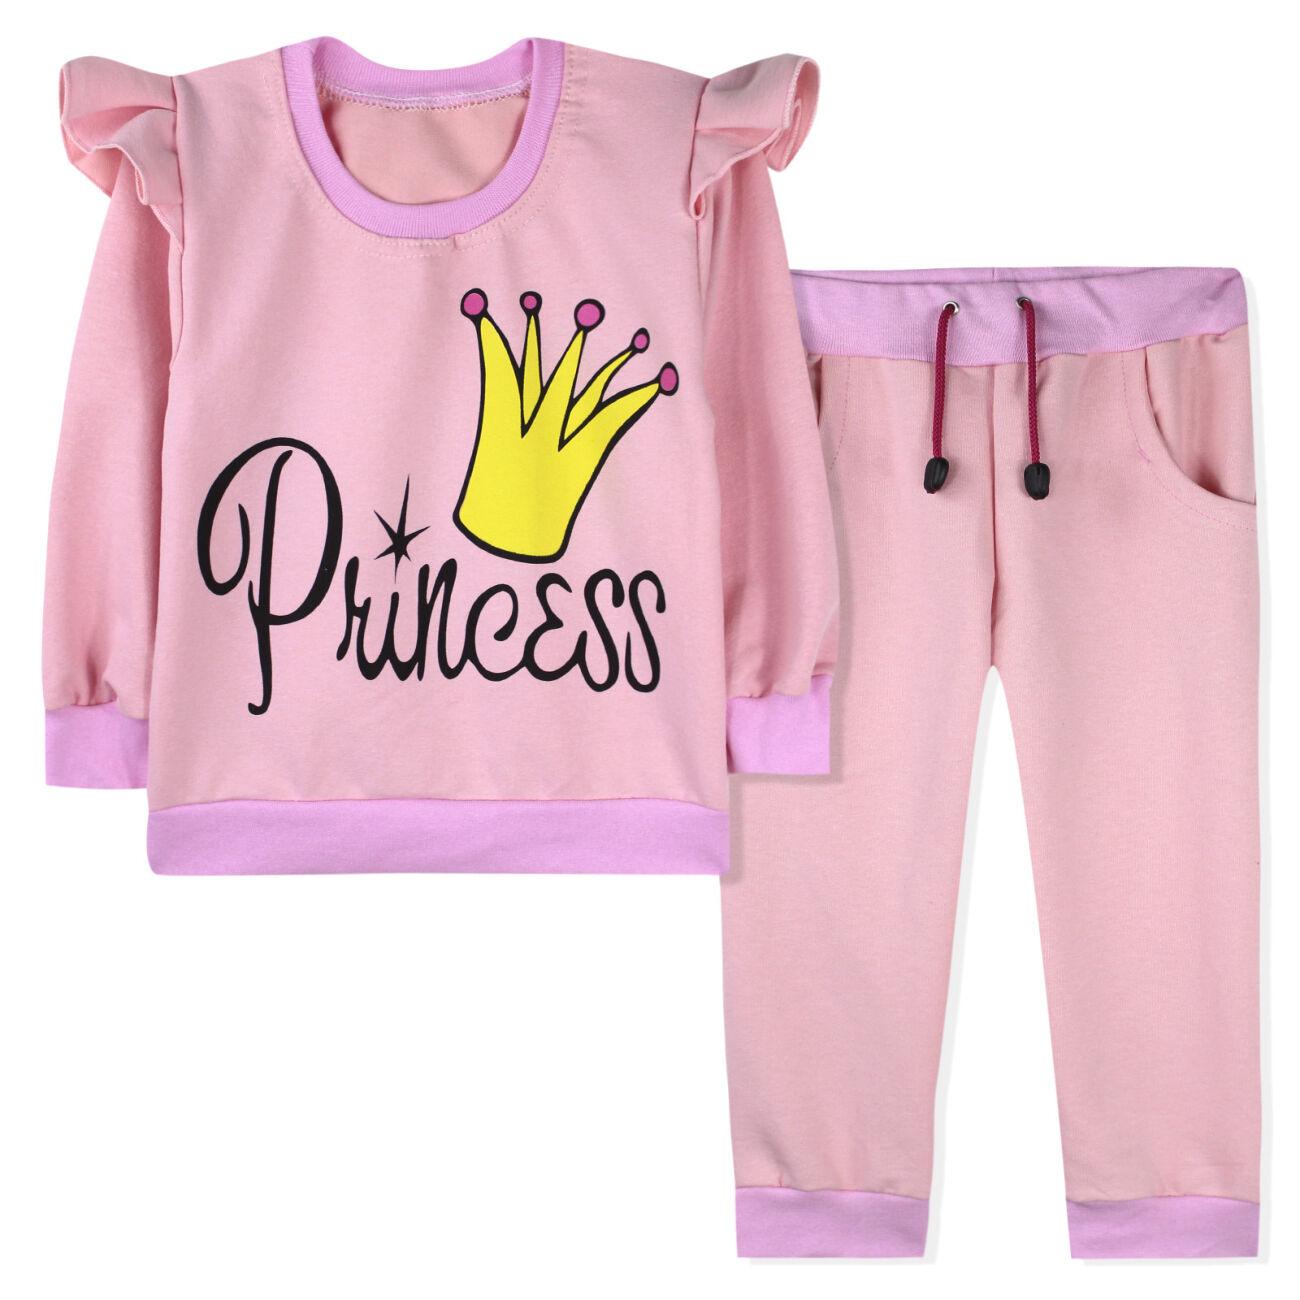 Костюм для девочки, розовый. Принцесса